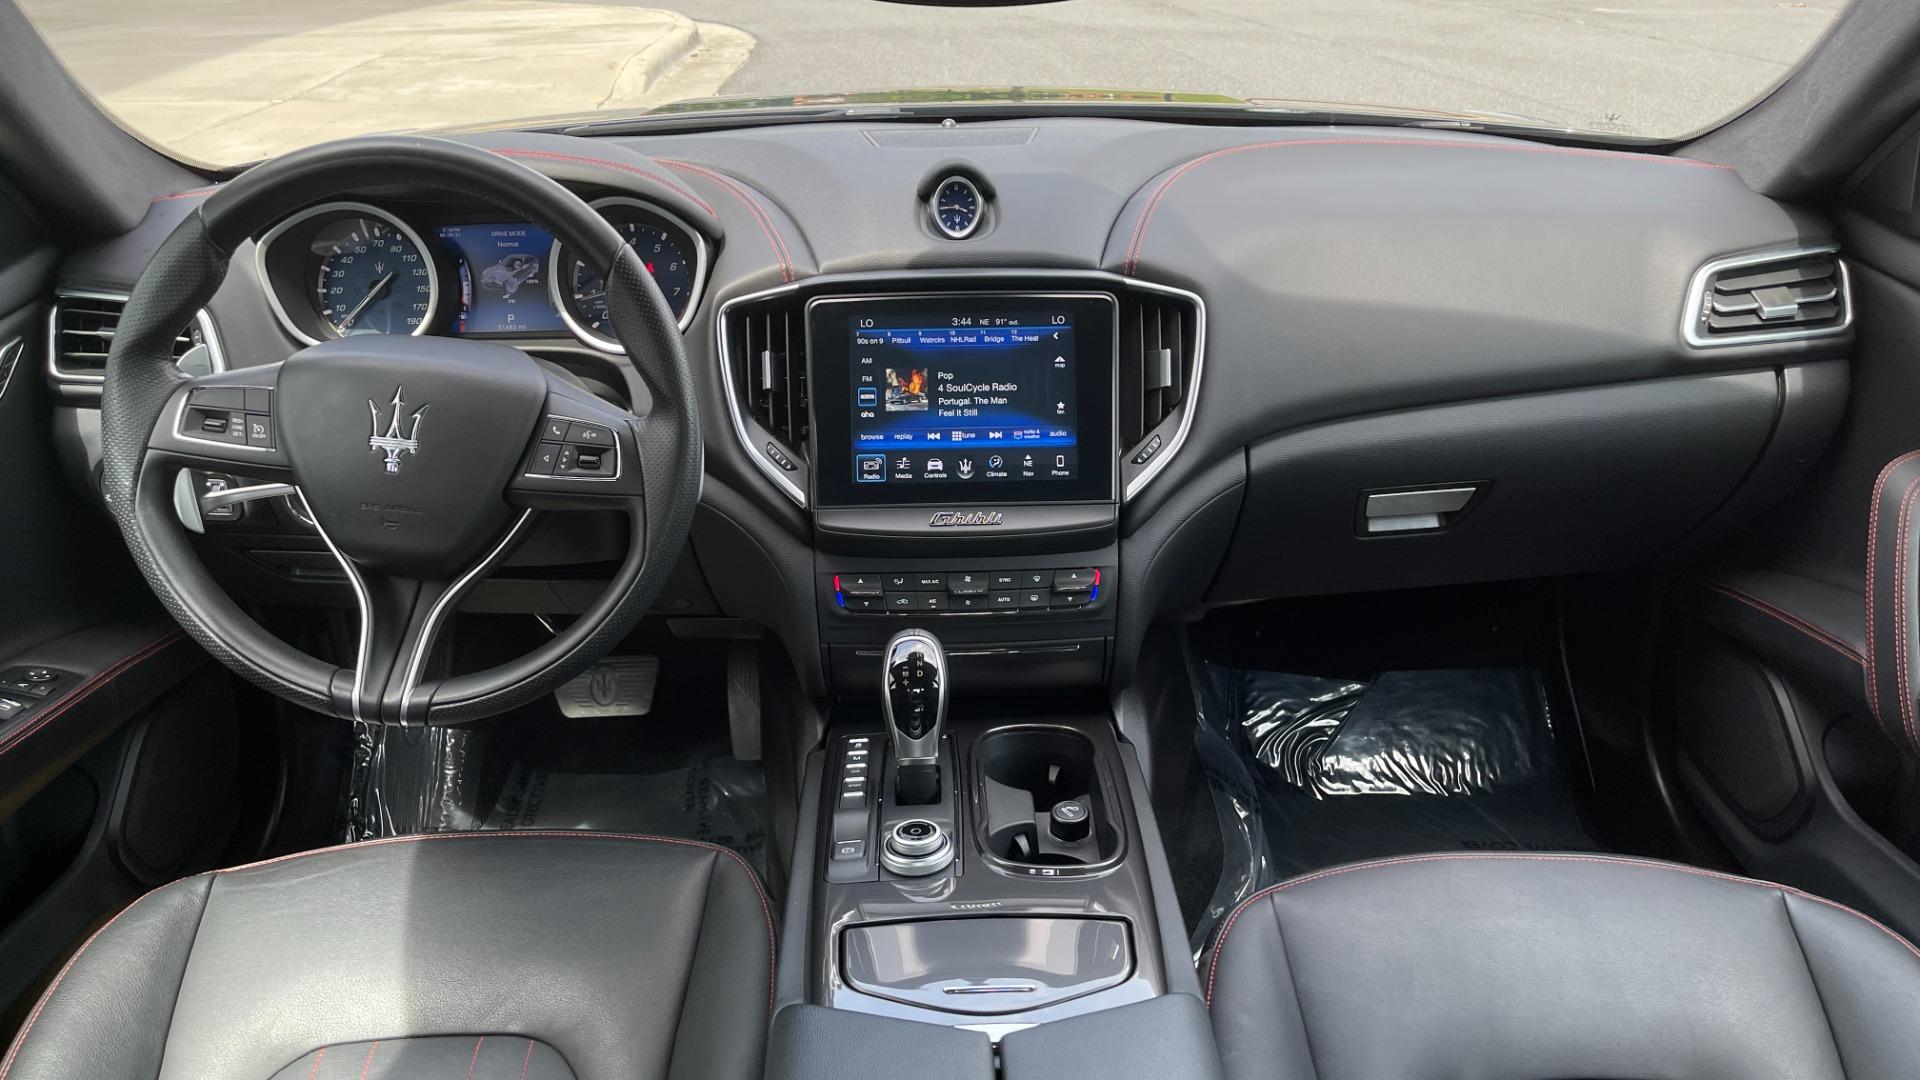 Used 2018 Maserati GHIBLI S Q4 SEDAN / AWD / 3.0L V6 / SUNROOF / NAV / REARVIEW for sale $51,995 at Formula Imports in Charlotte NC 28227 50